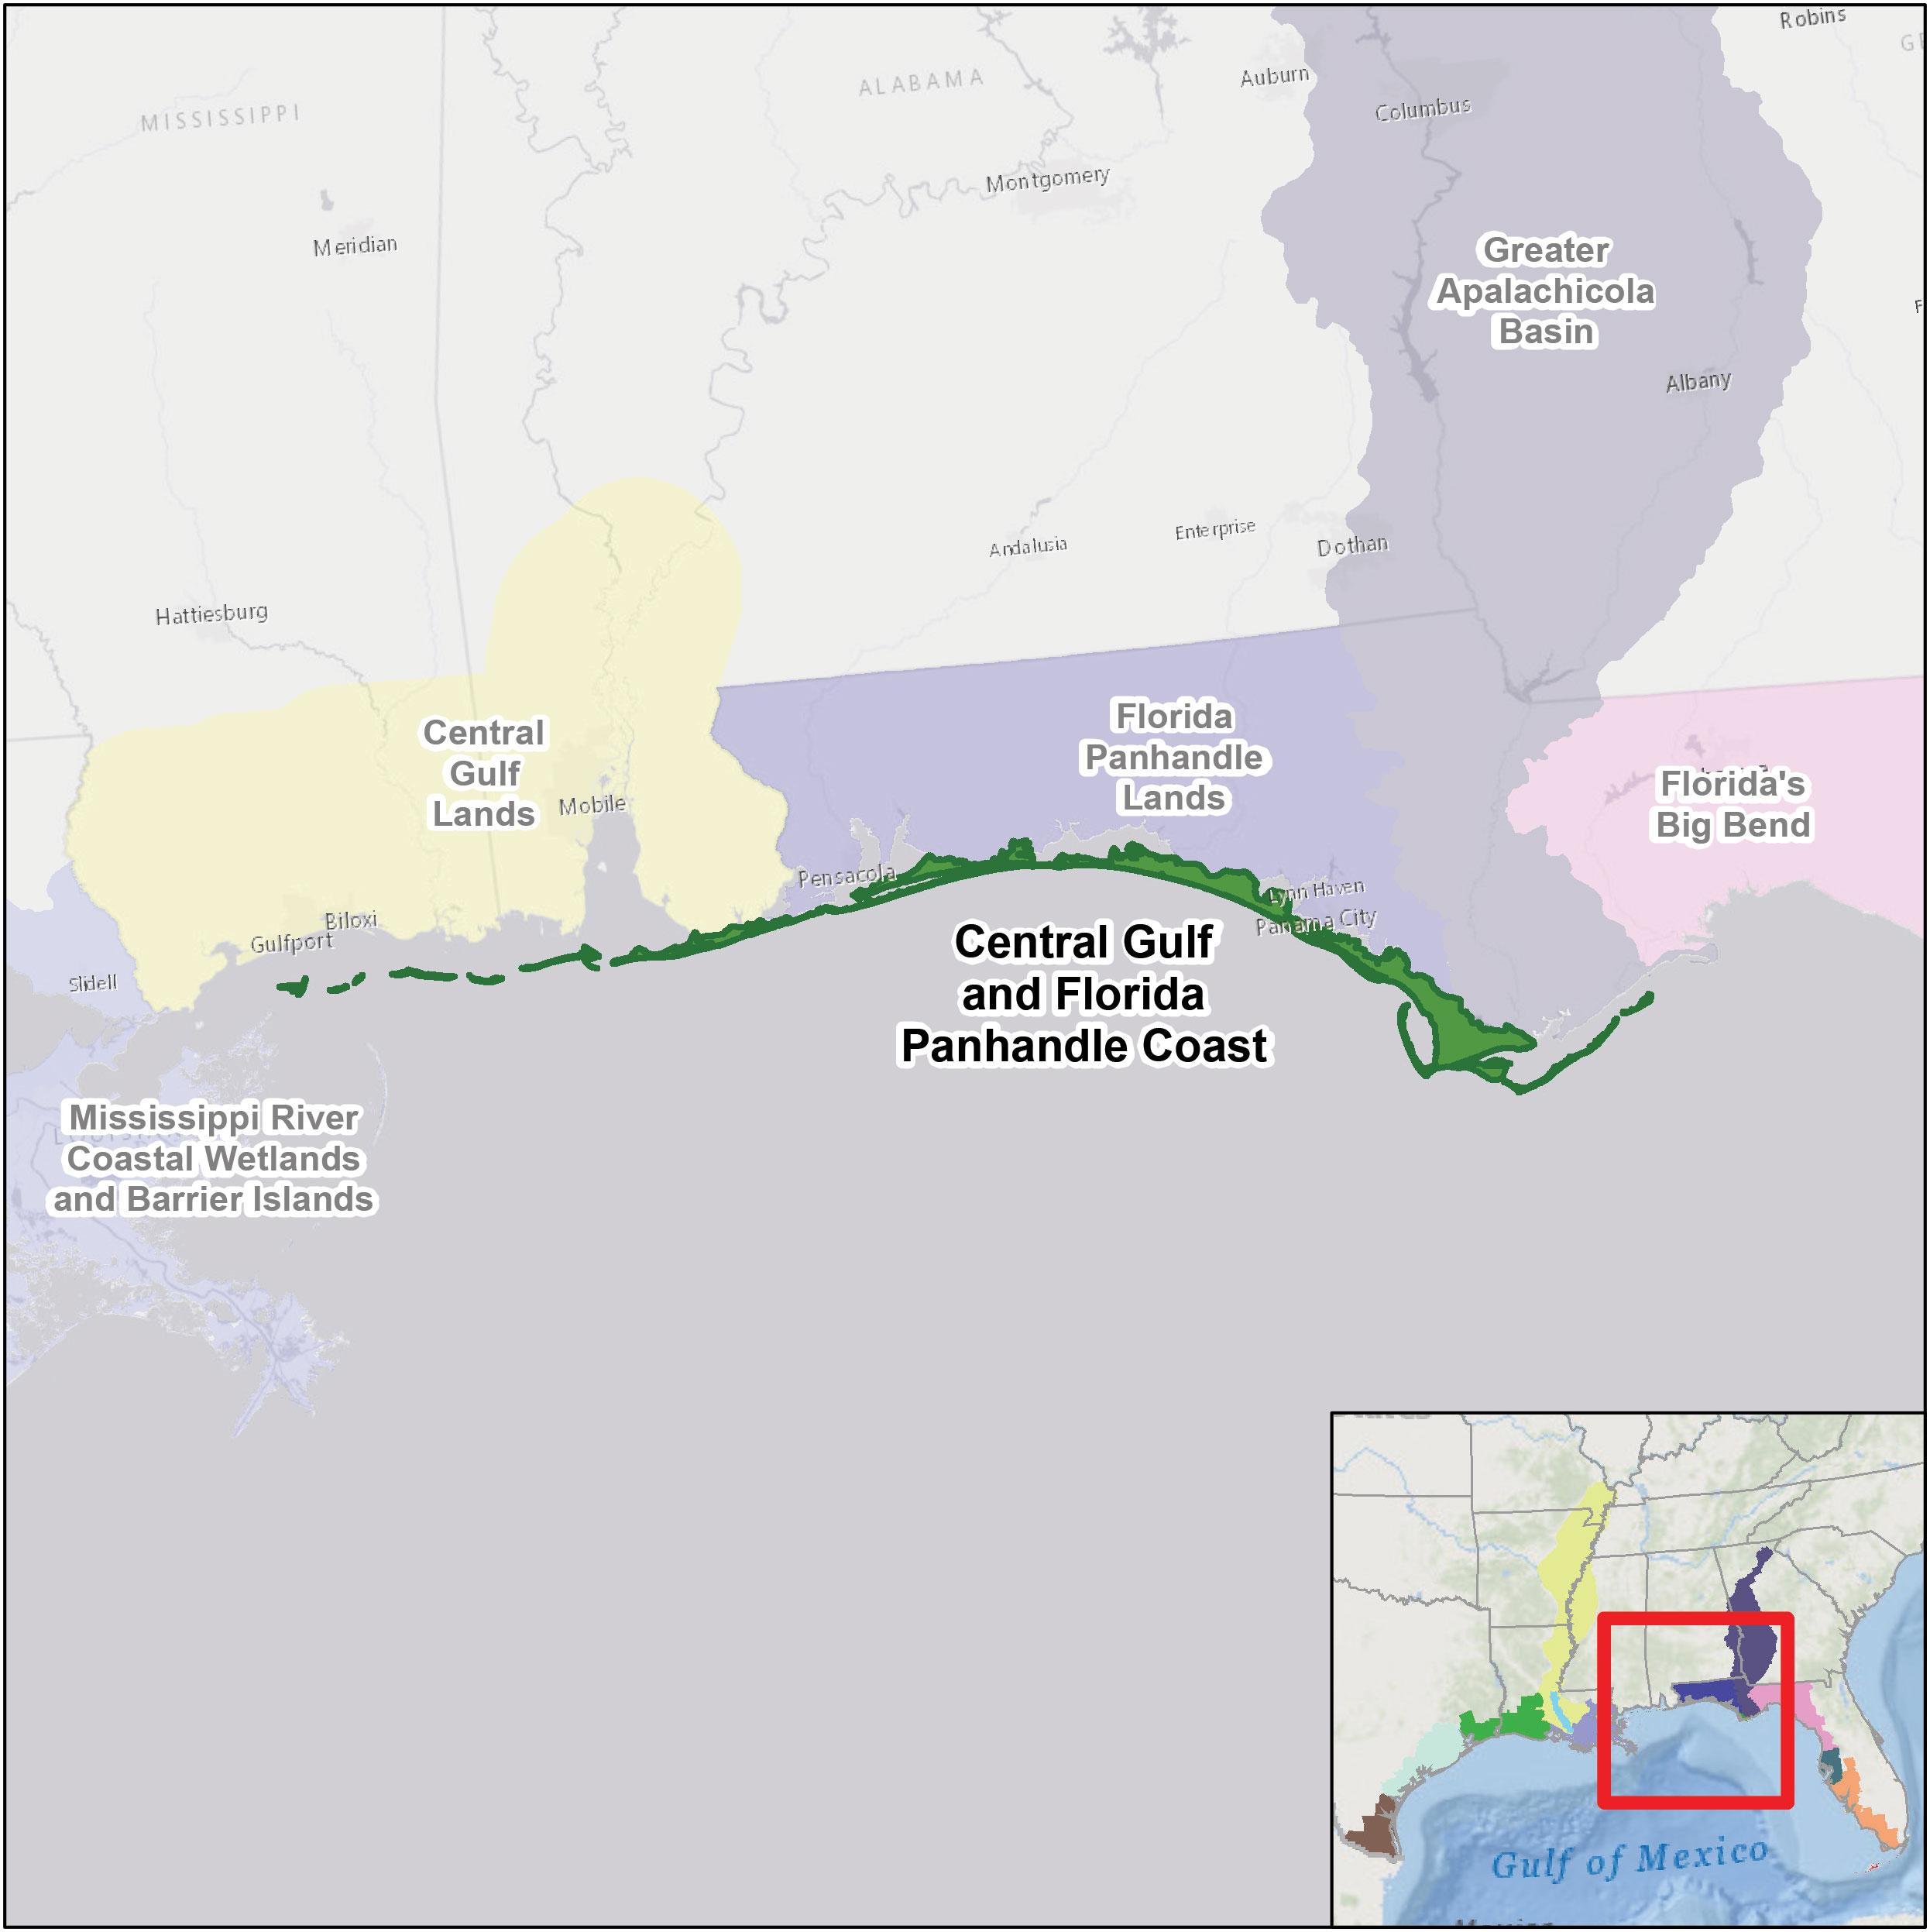 Central Gulf And Florida Panhandle Coast   U.s. Fish & Wildlife Service - Map Of Florida Panhandle Gulf Coast